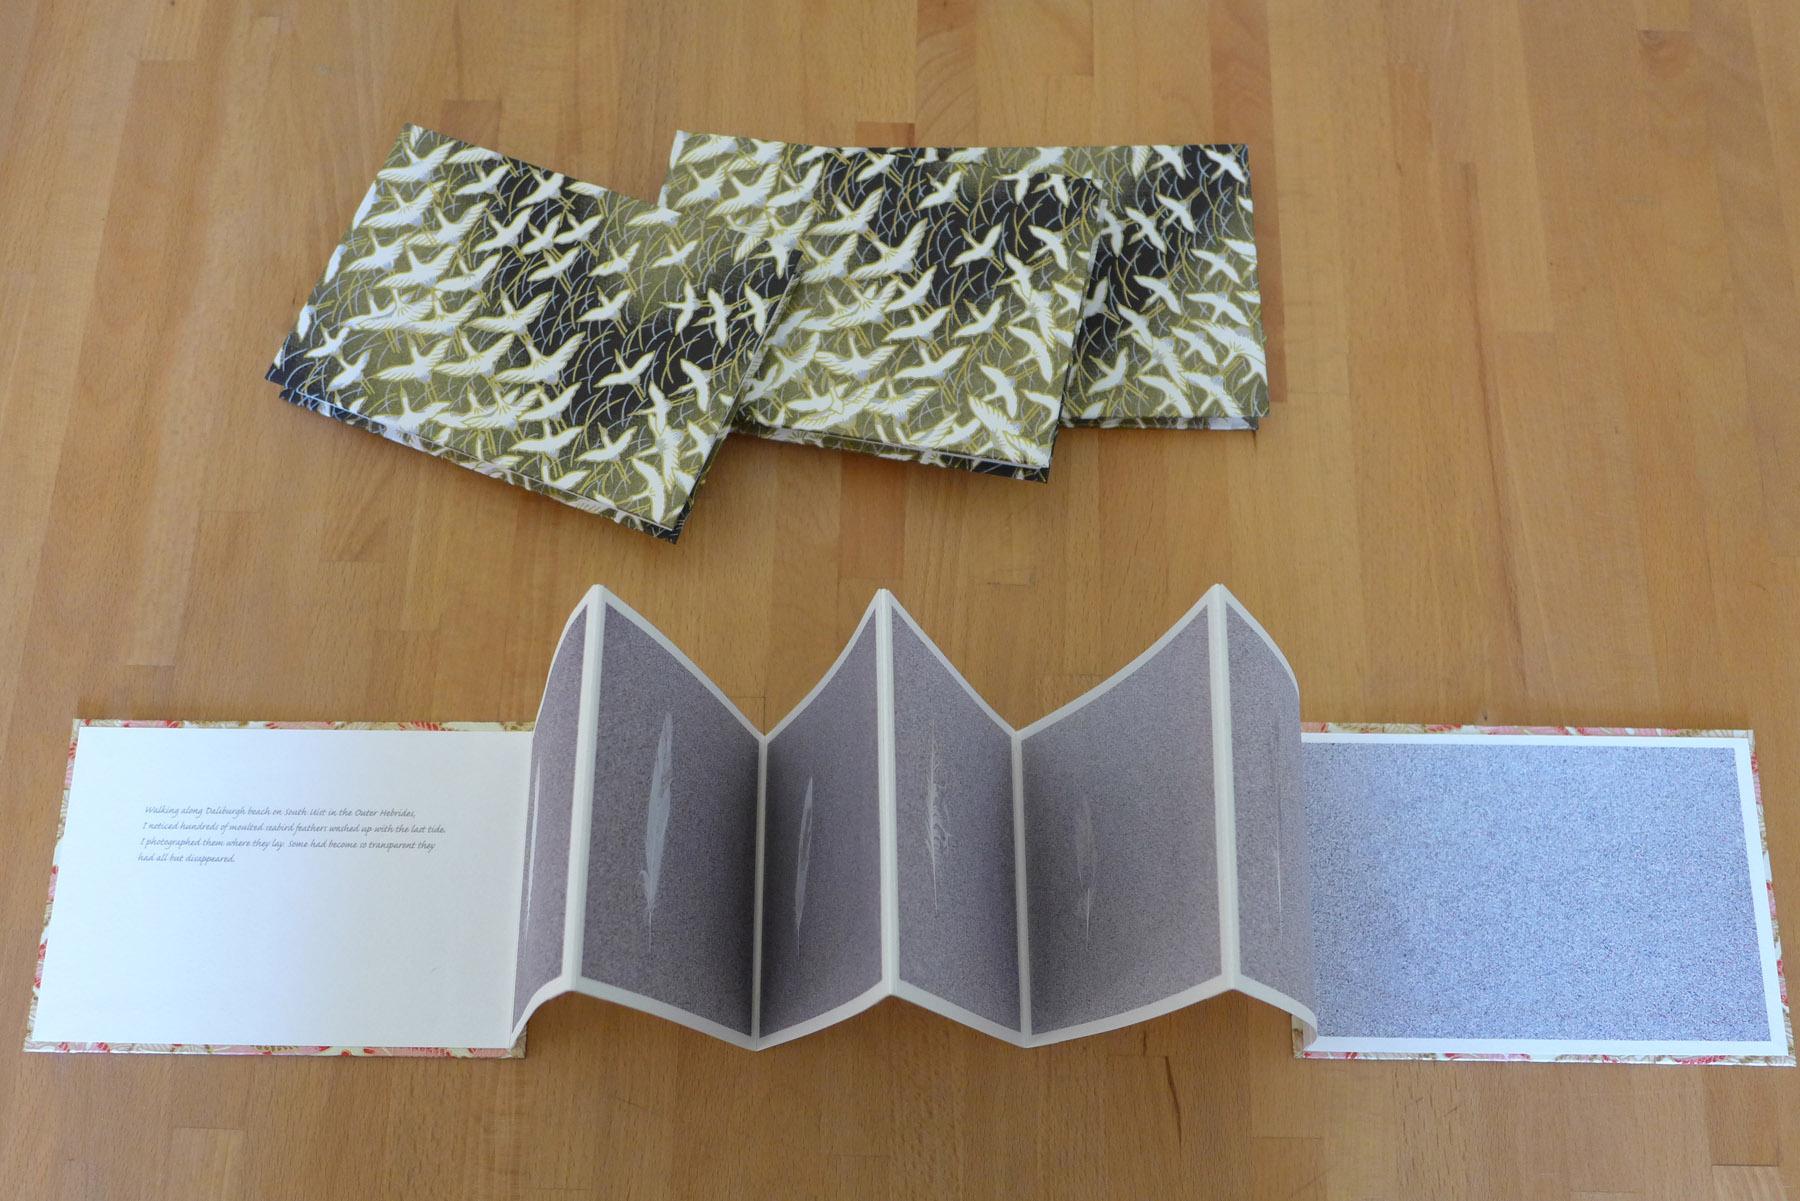 Feathers concertina books